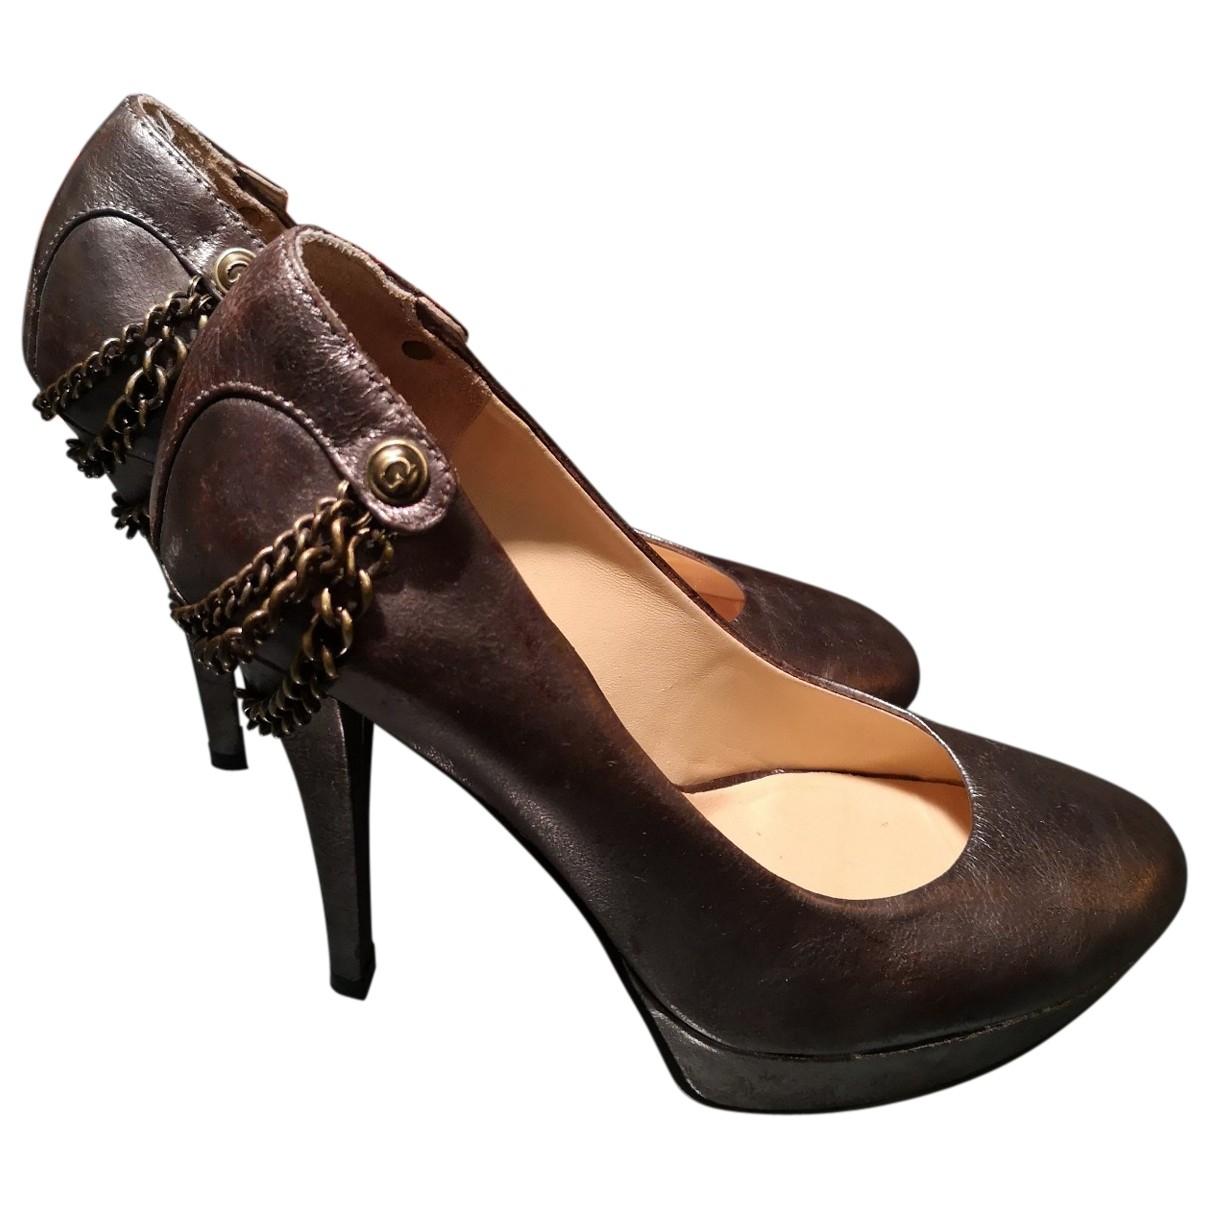 Guess \N Leather Heels for Women 37 EU